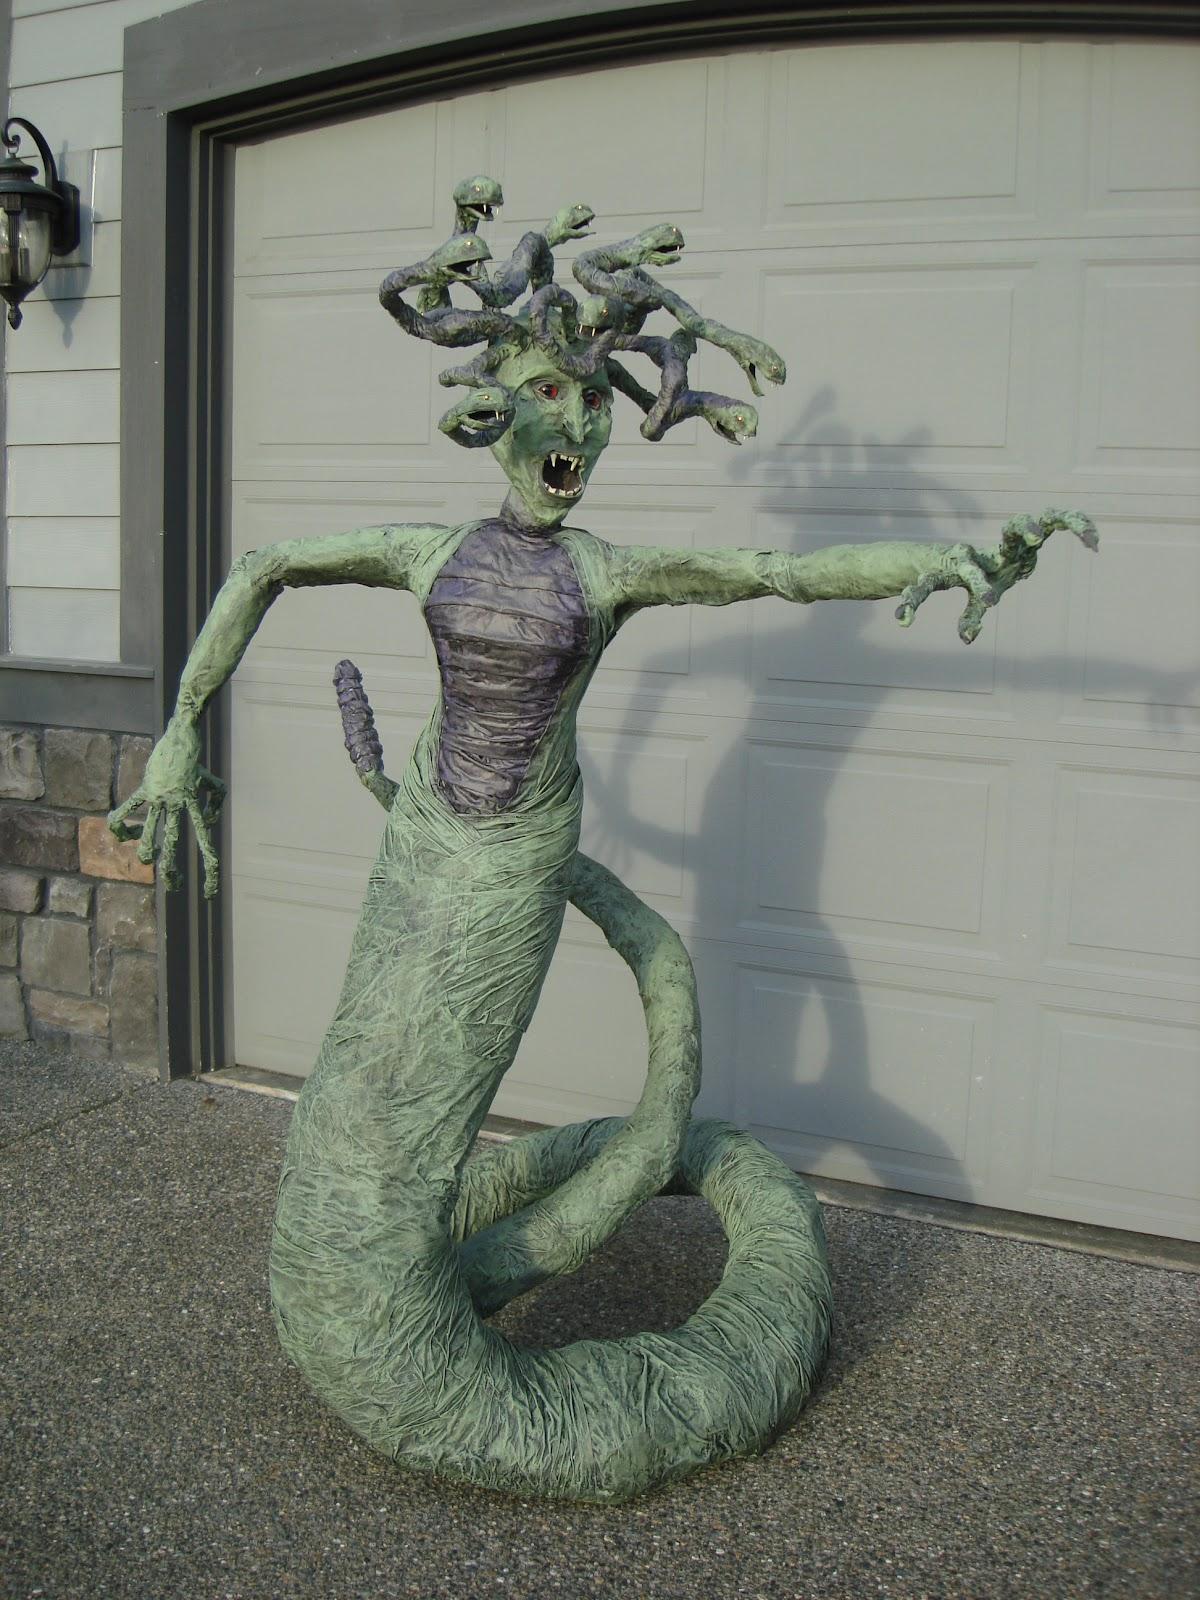 Comparison: Perseus Holding the Head of Medusa